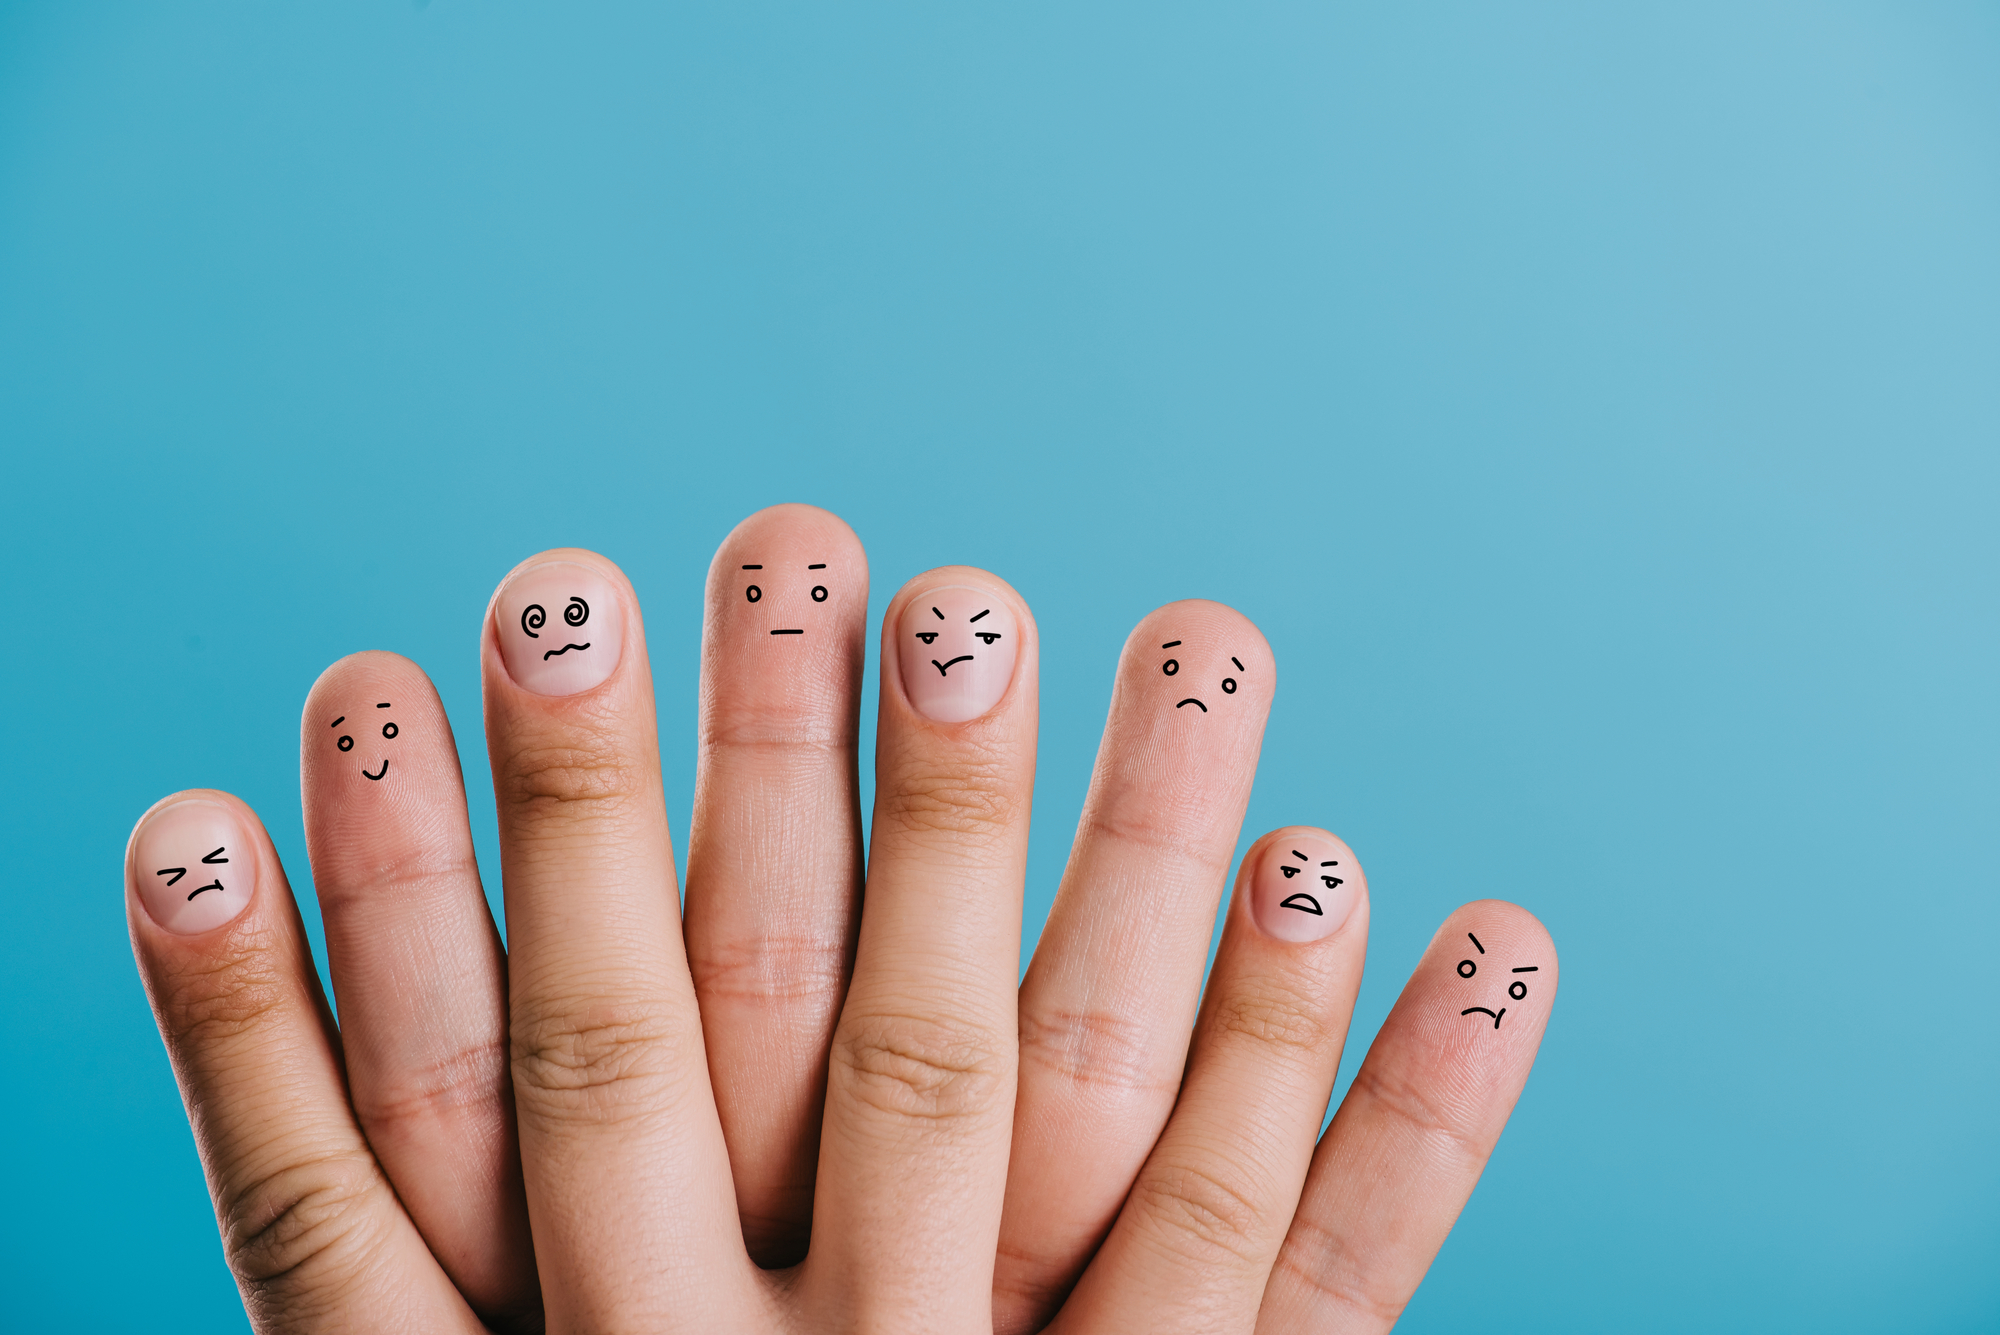 Human fingers showing different emotions felt during divorce